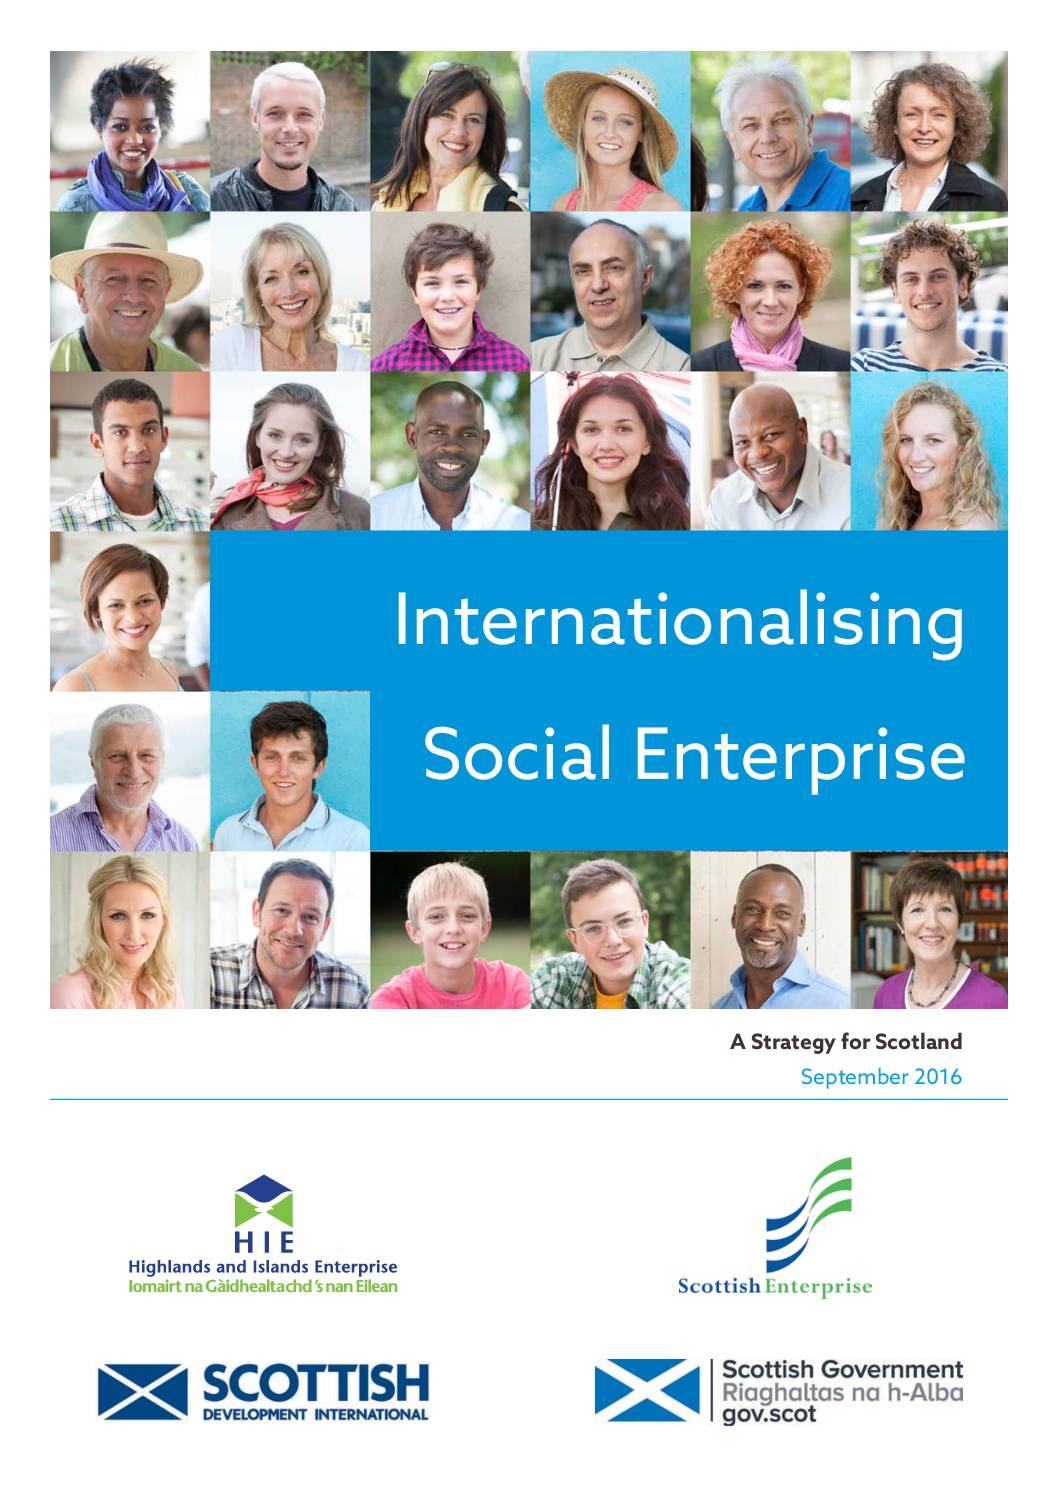 Internationalising Social Enterprise in Scotland